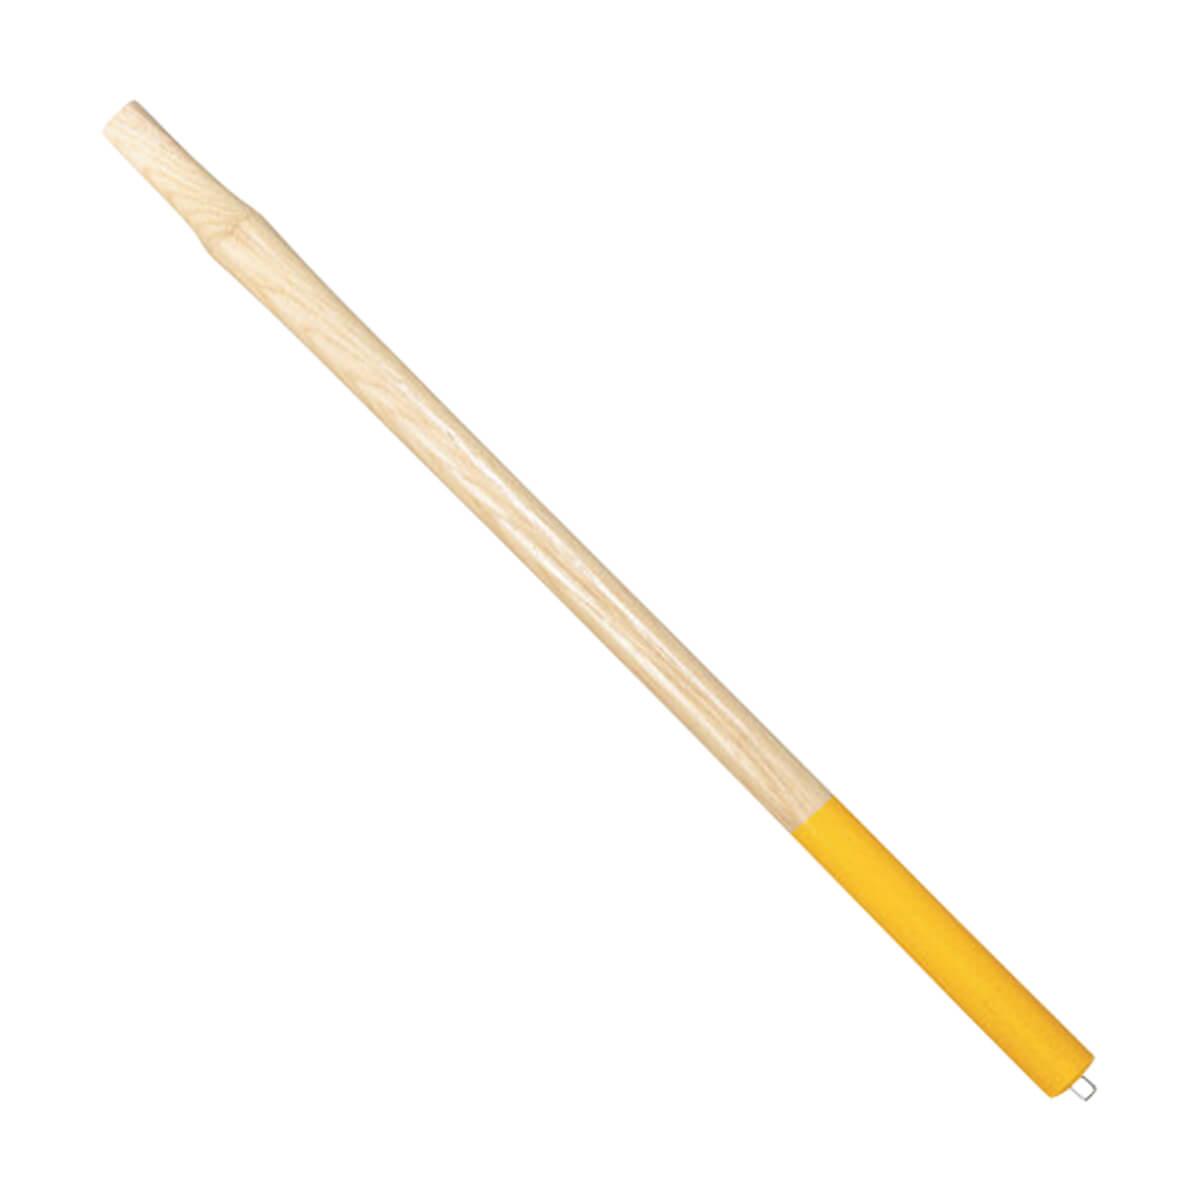 Garant Sledge Hammer Handle - 36'' long